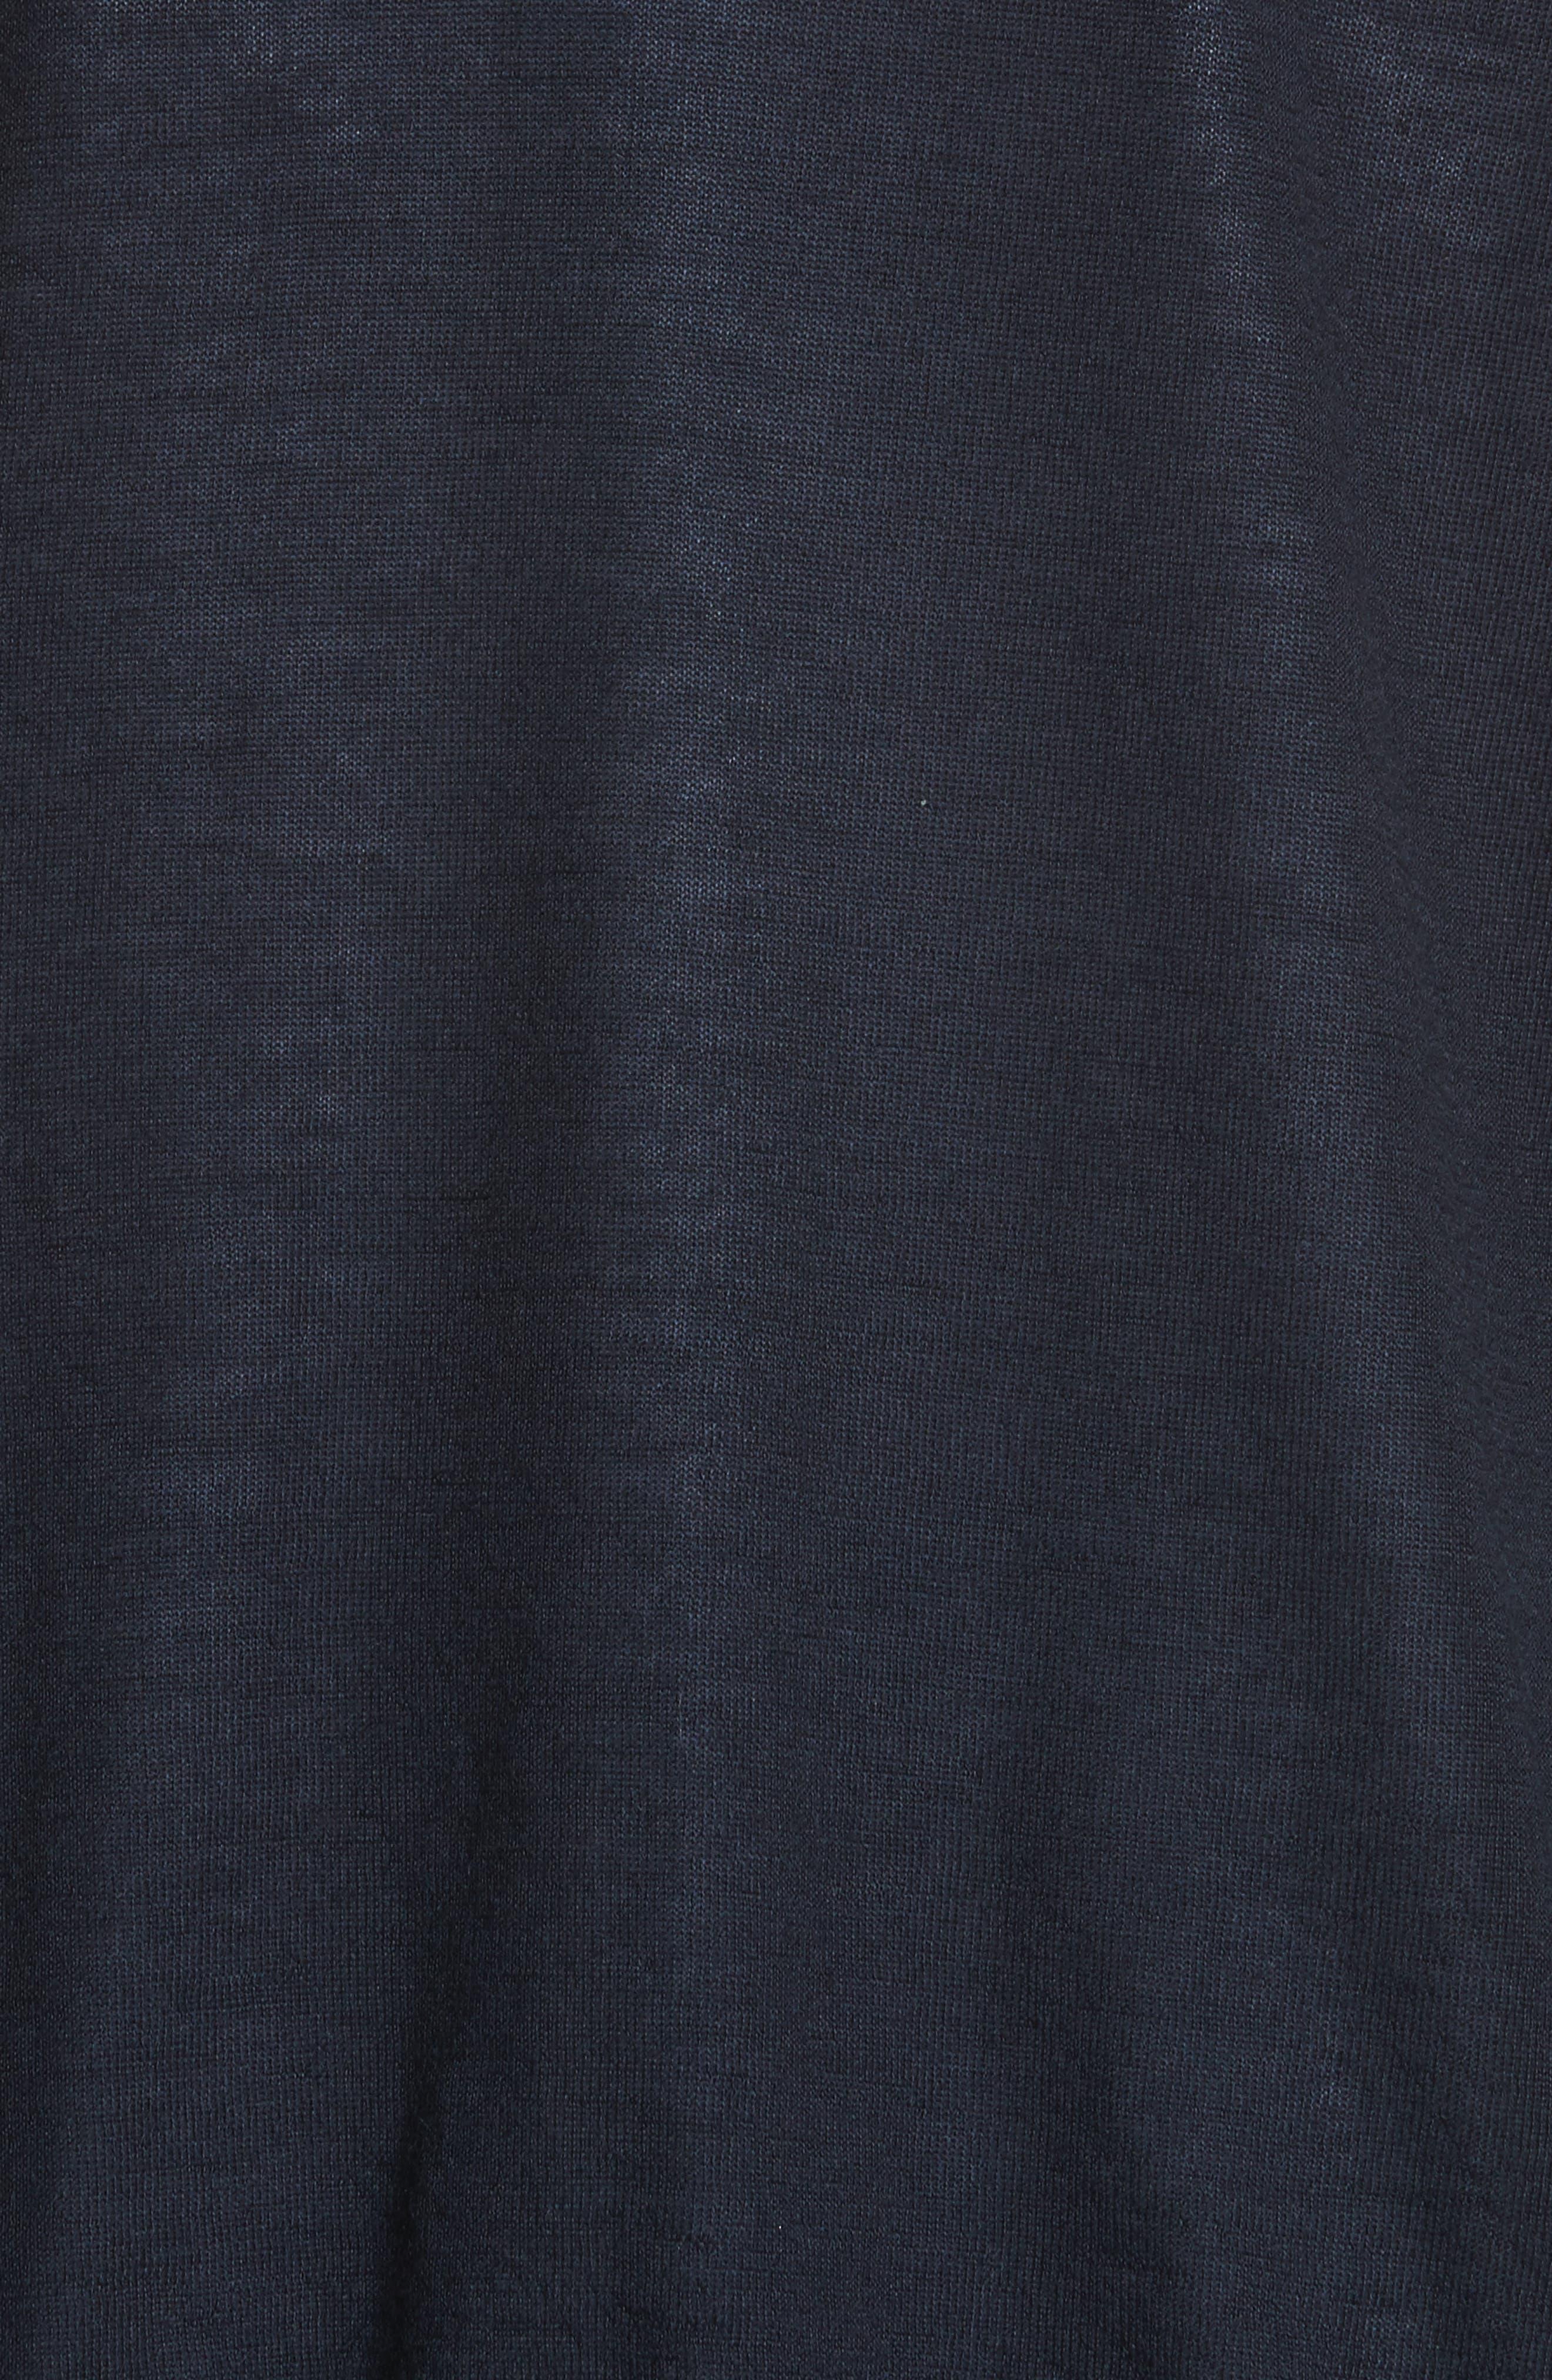 Vela Cashmere Sweater,                             Alternate thumbnail 5, color,                             411